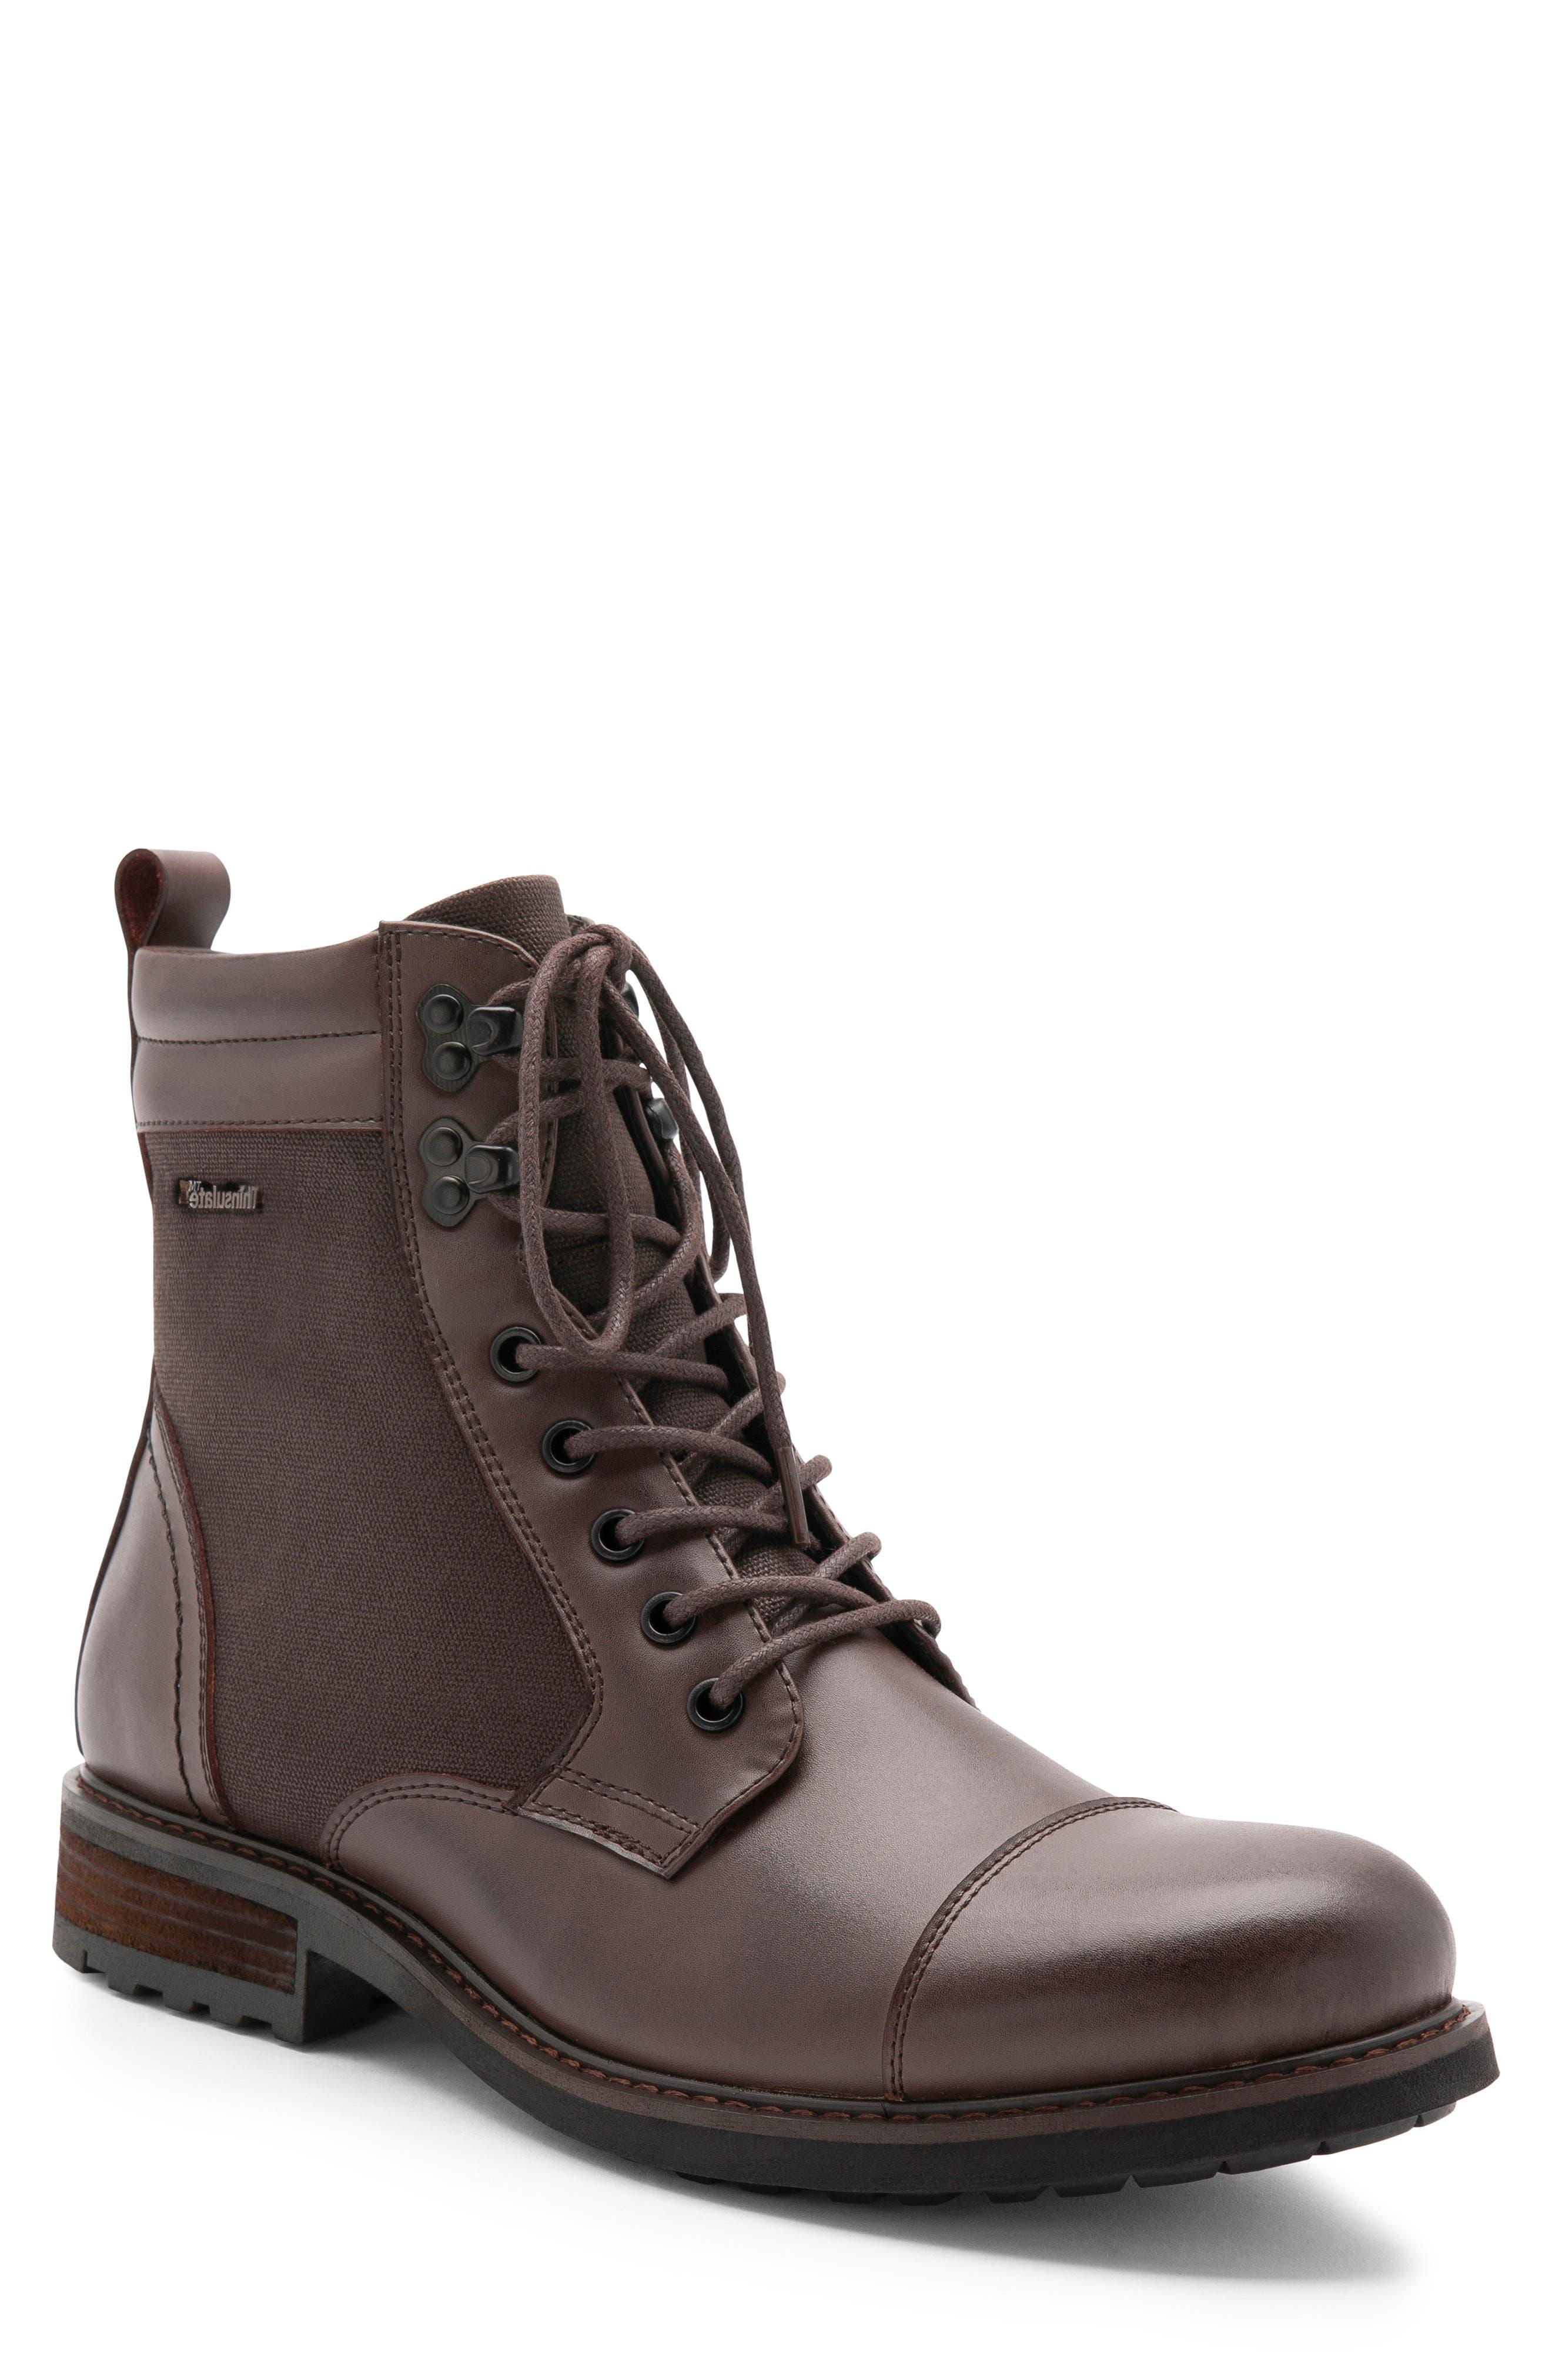 Blondo Paxton Waterproof Cap Toe Boot, Brown